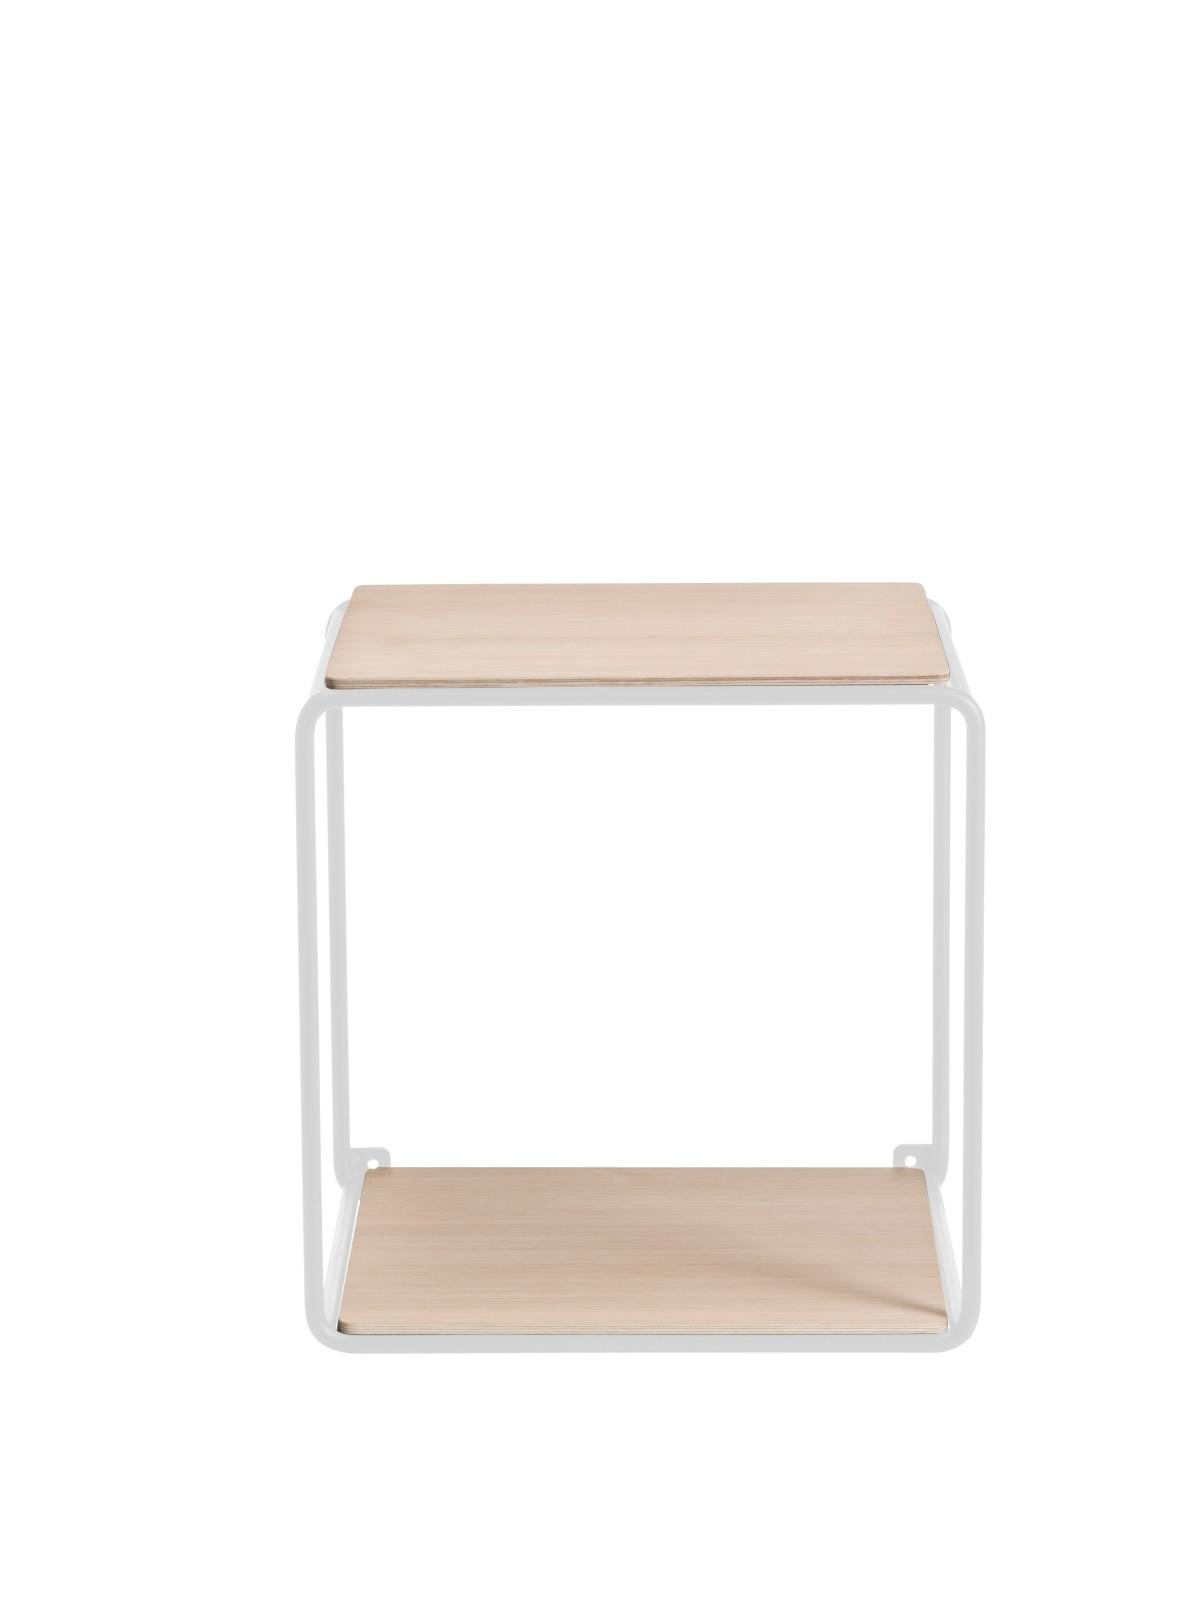 Anywhere System Shelf Anywhere 1 x 1 w. 2 shelves White/Oak